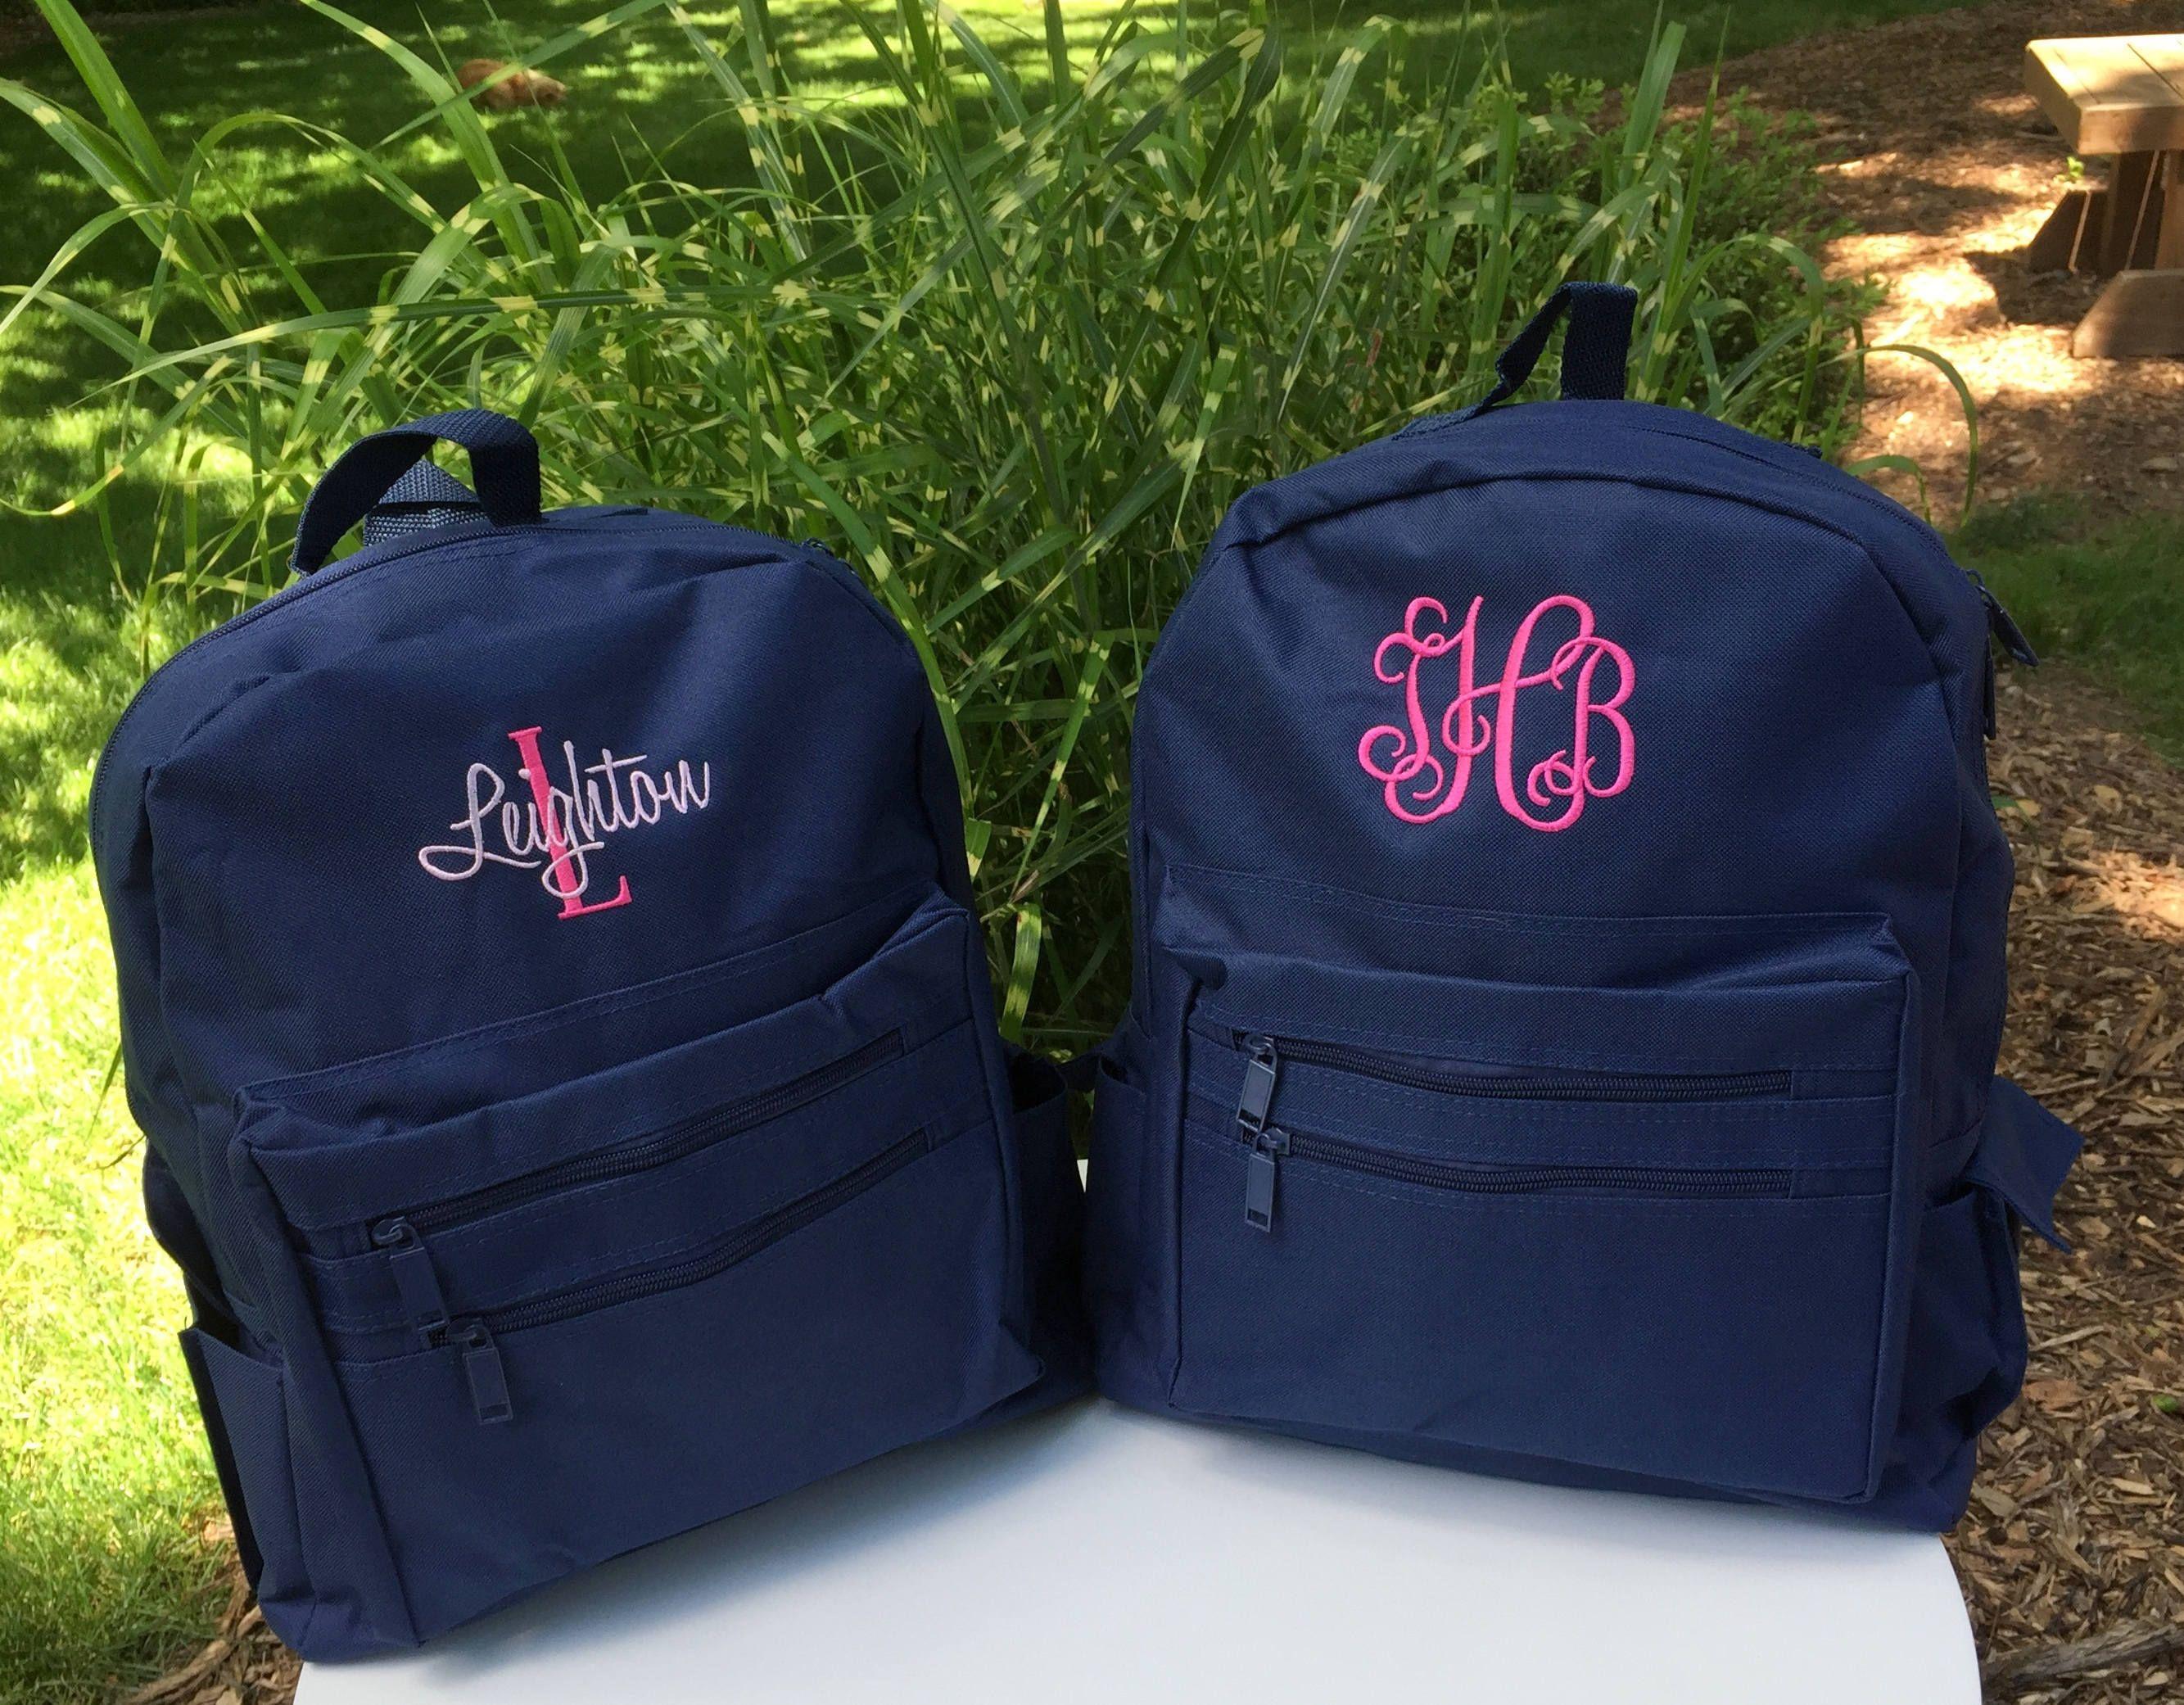 Monogrammed Backpack - Personalized School Girls Back Pack - Book Bag - Kids  Children - Kid Back Pack - Child Bag by MJMonograms on Etsy aec547cd2483b